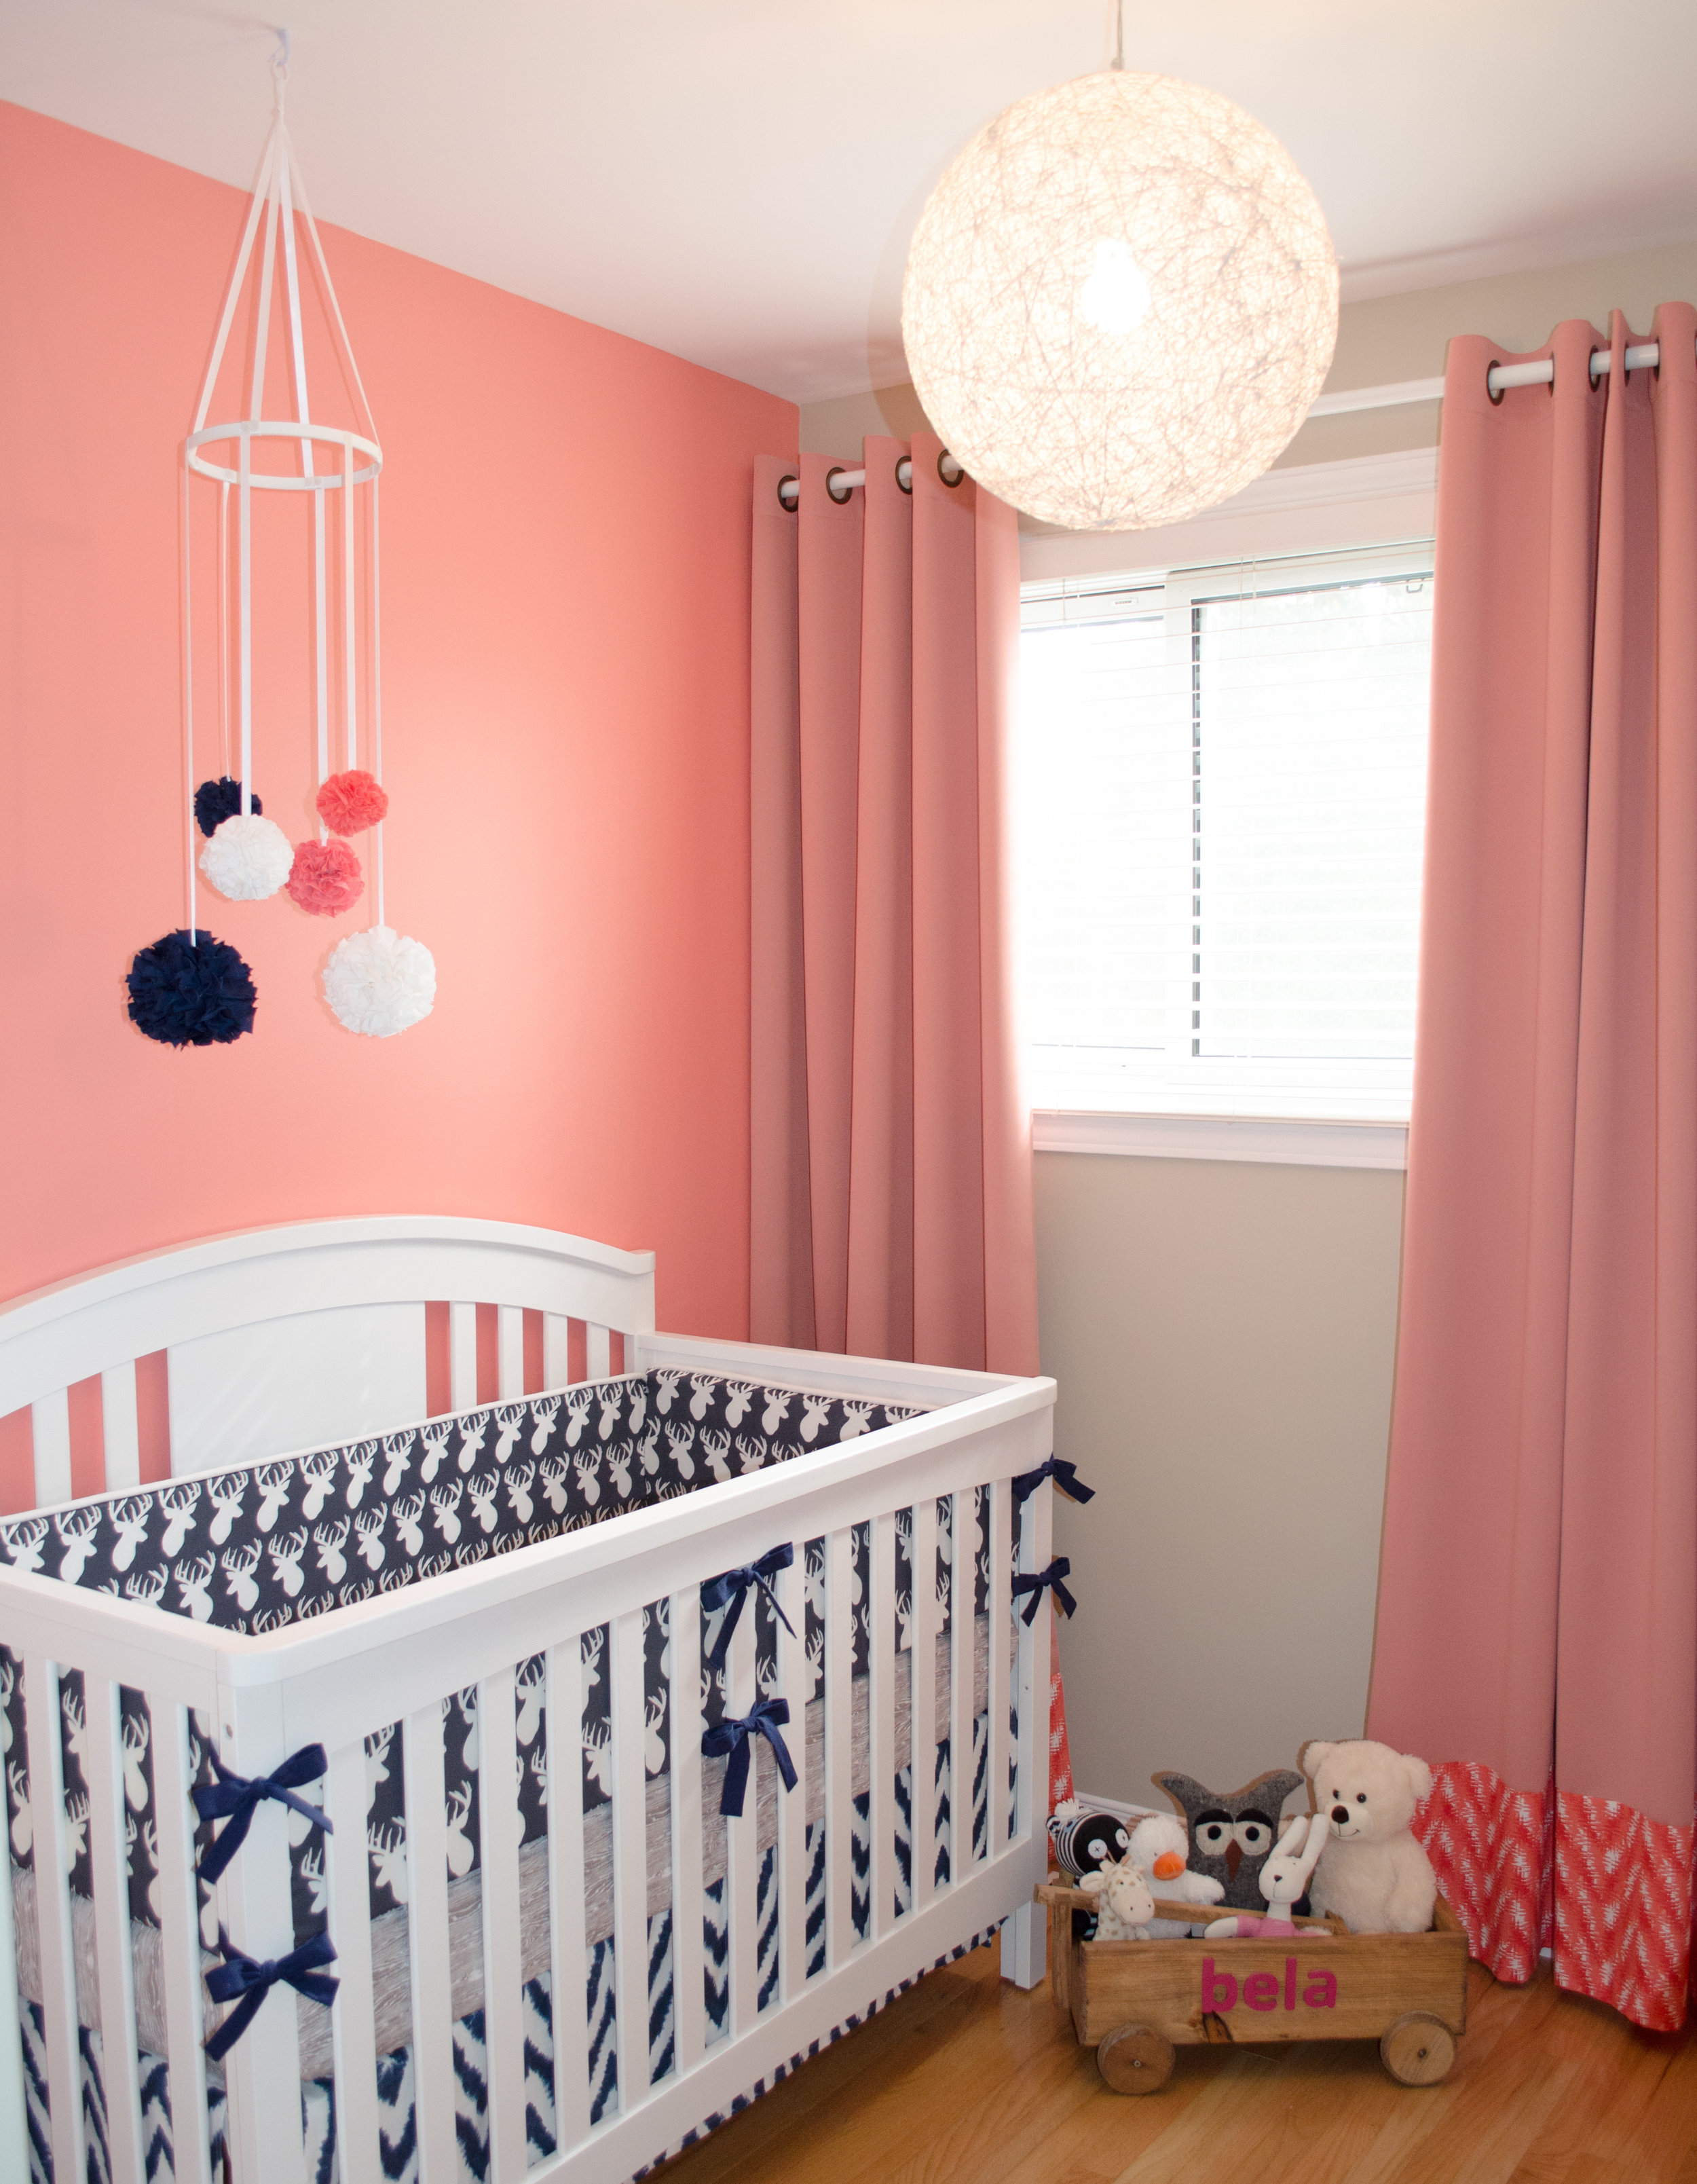 Bela's Nursery 1.jpg